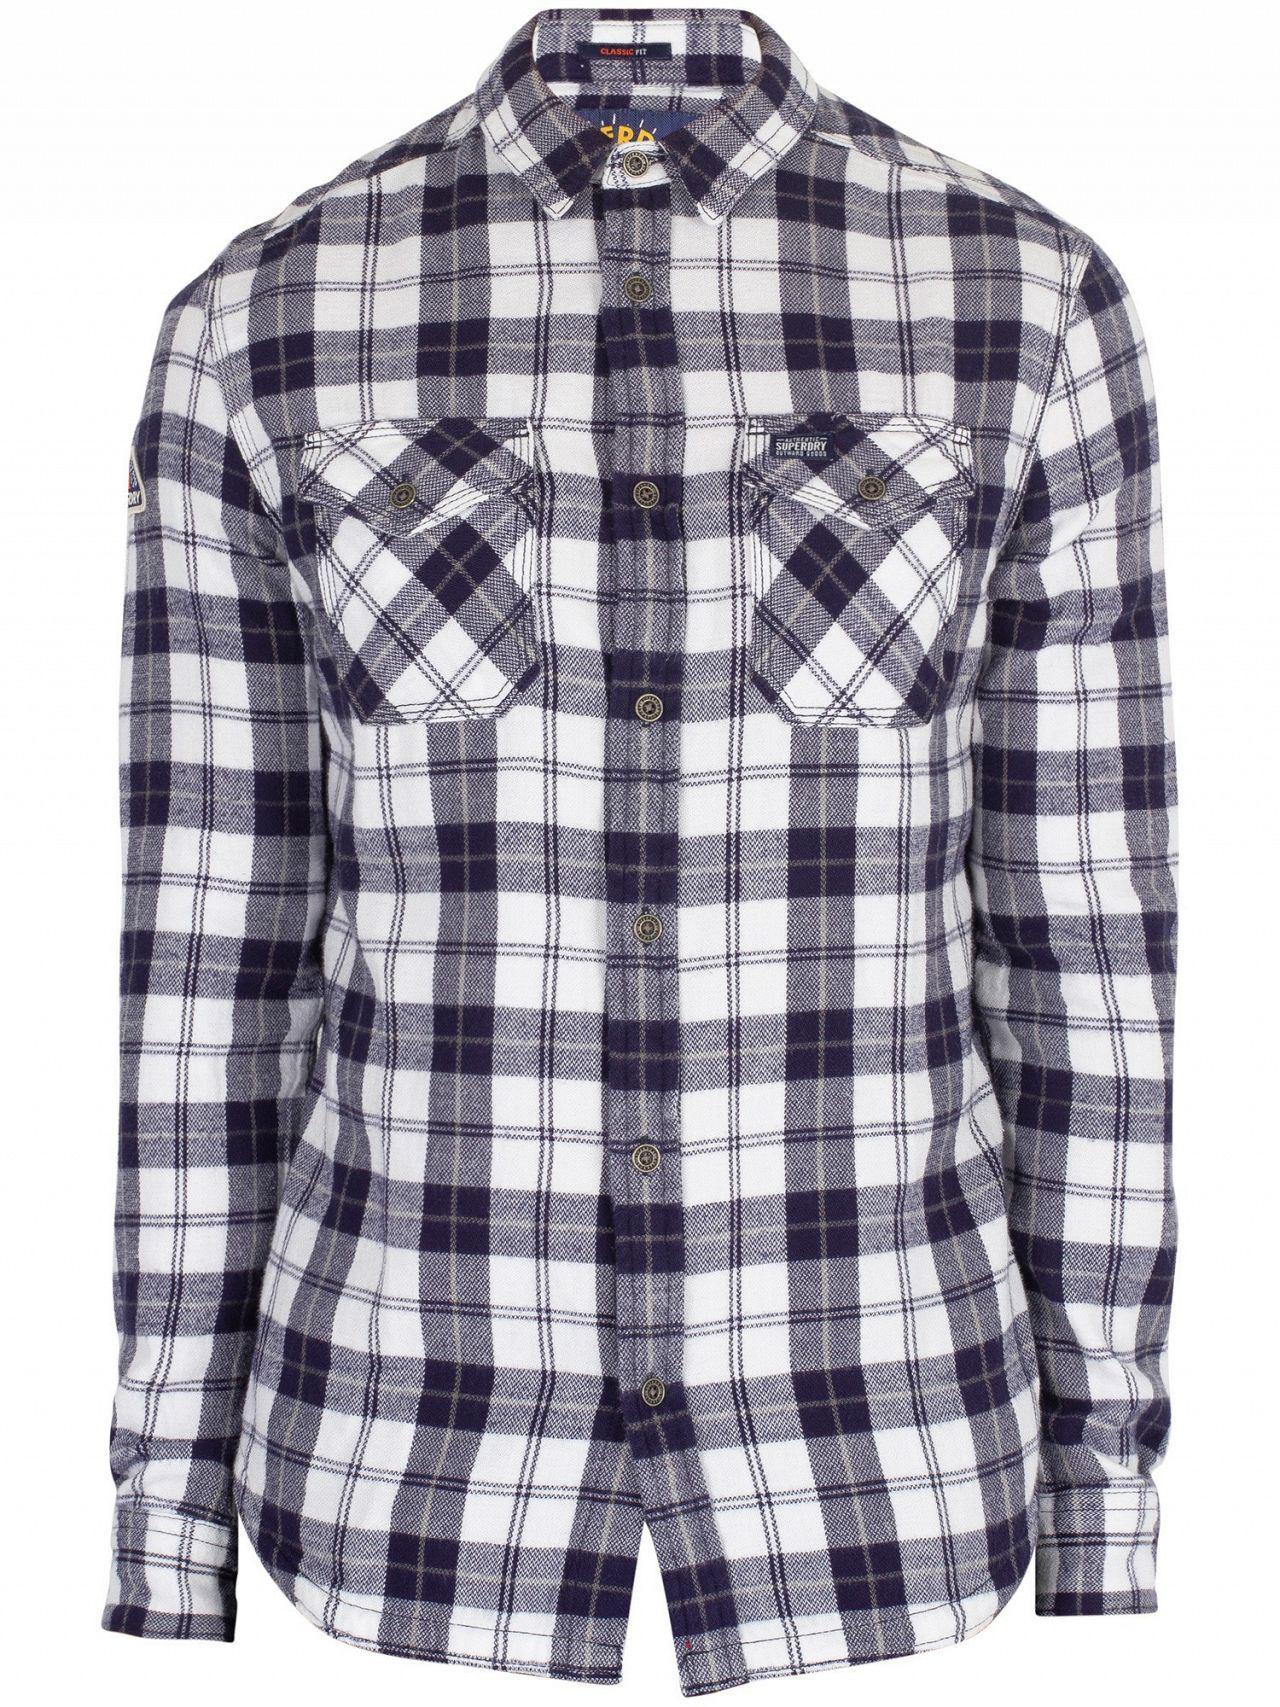 a1efd23751 Superdry - Broken Twill White Rookie Ridge Shirt for Men - Lyst. View  fullscreen